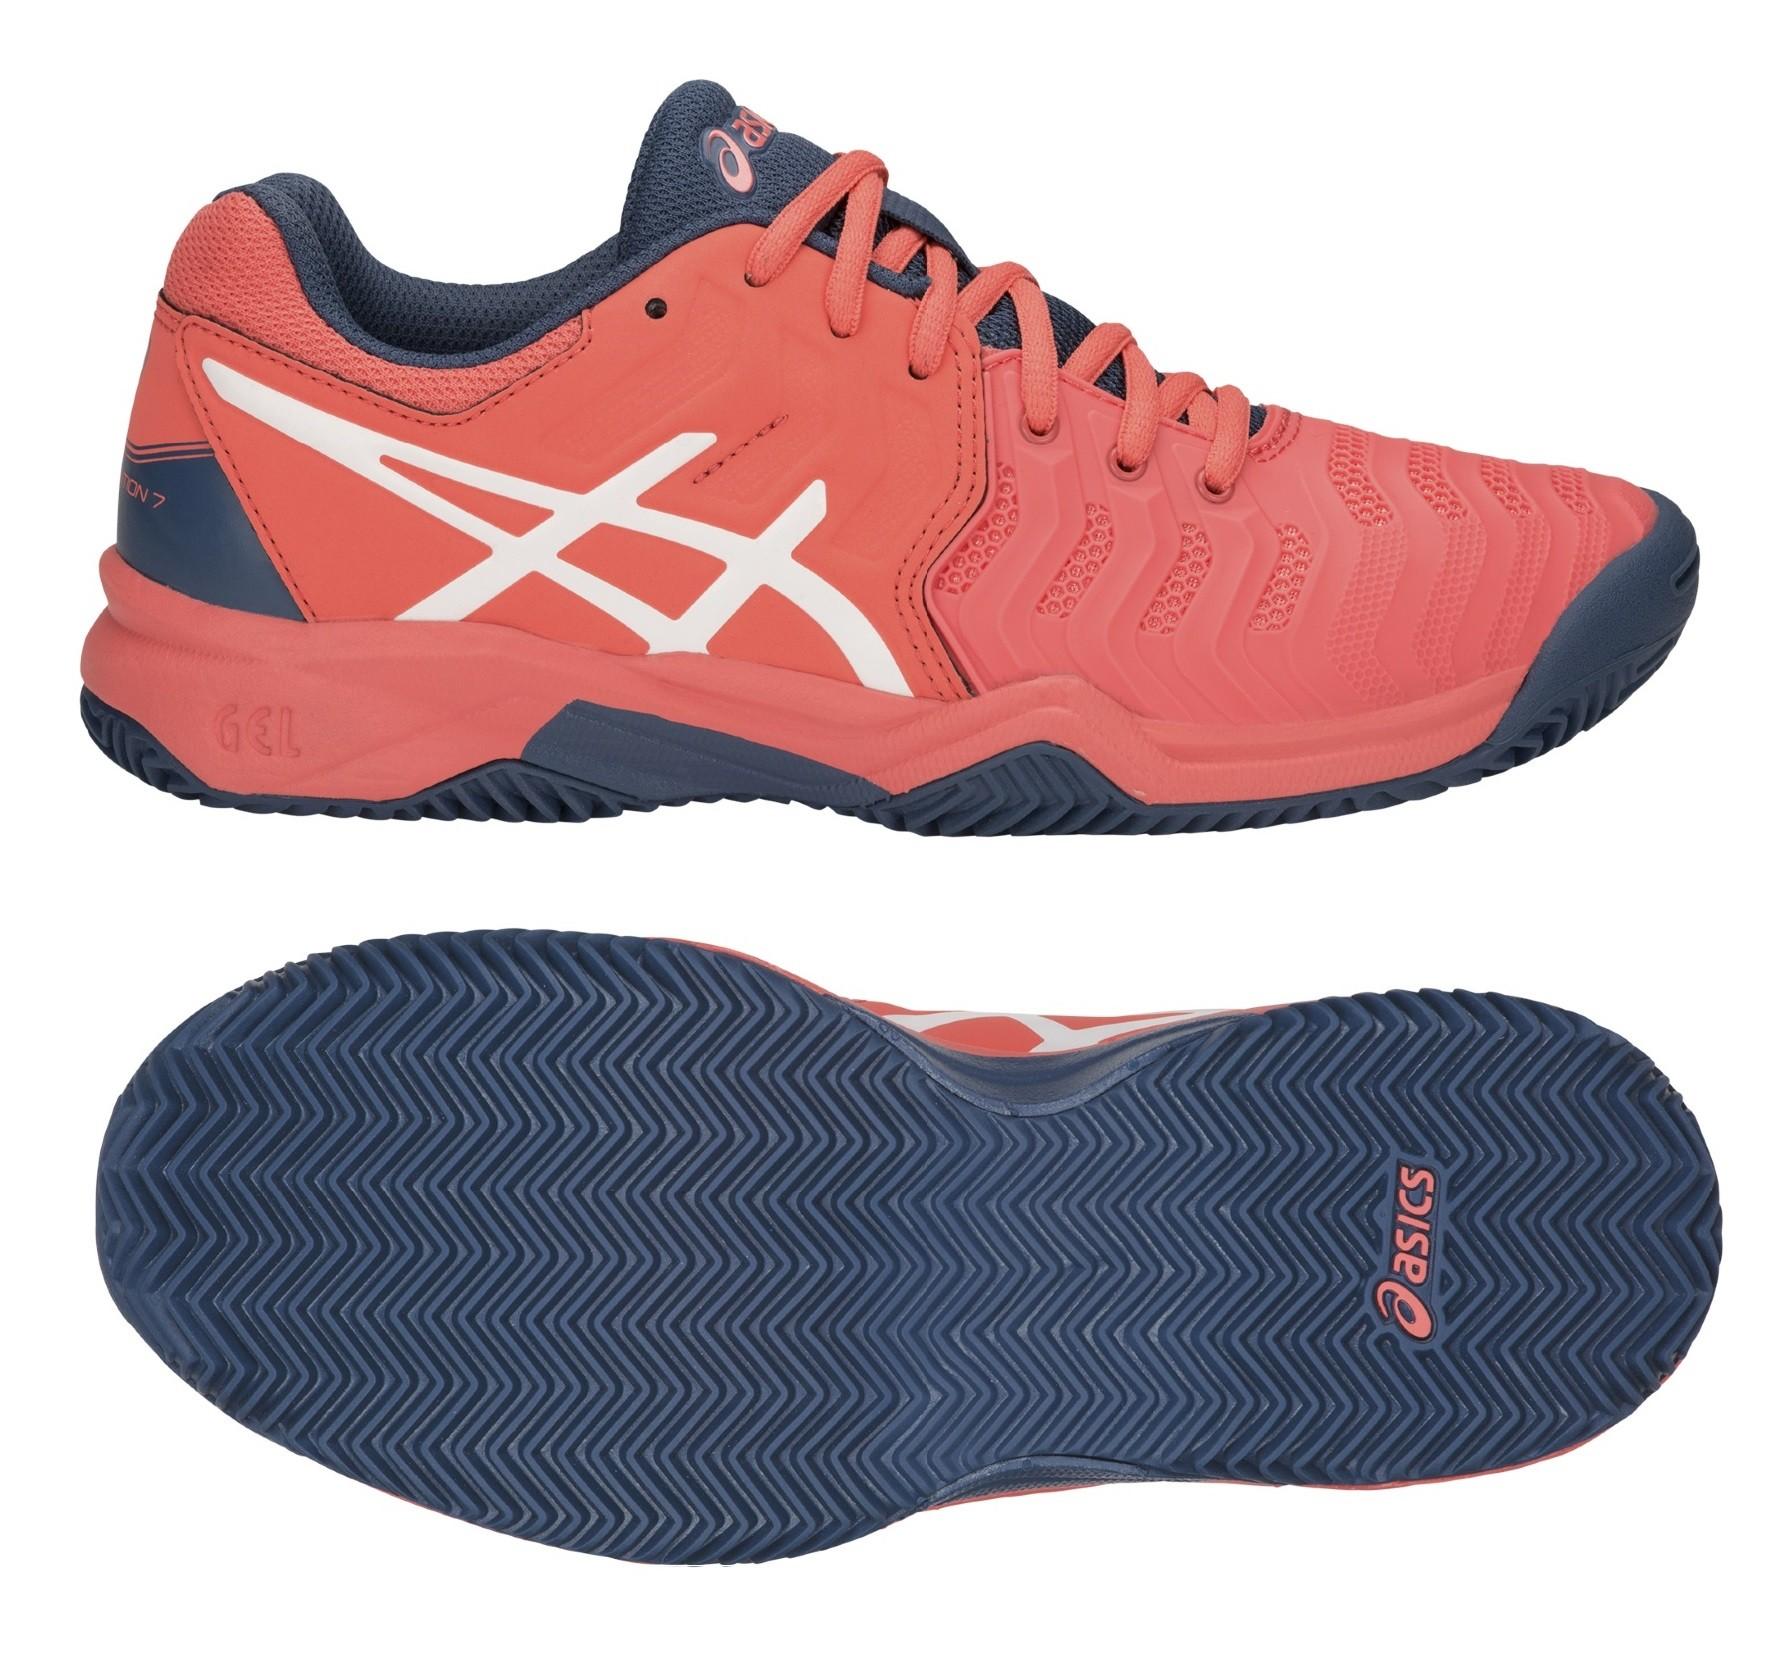 Dětská tenisová obuv Asics Gel Resolution 7 Clay GS C800Y-701 e334181090